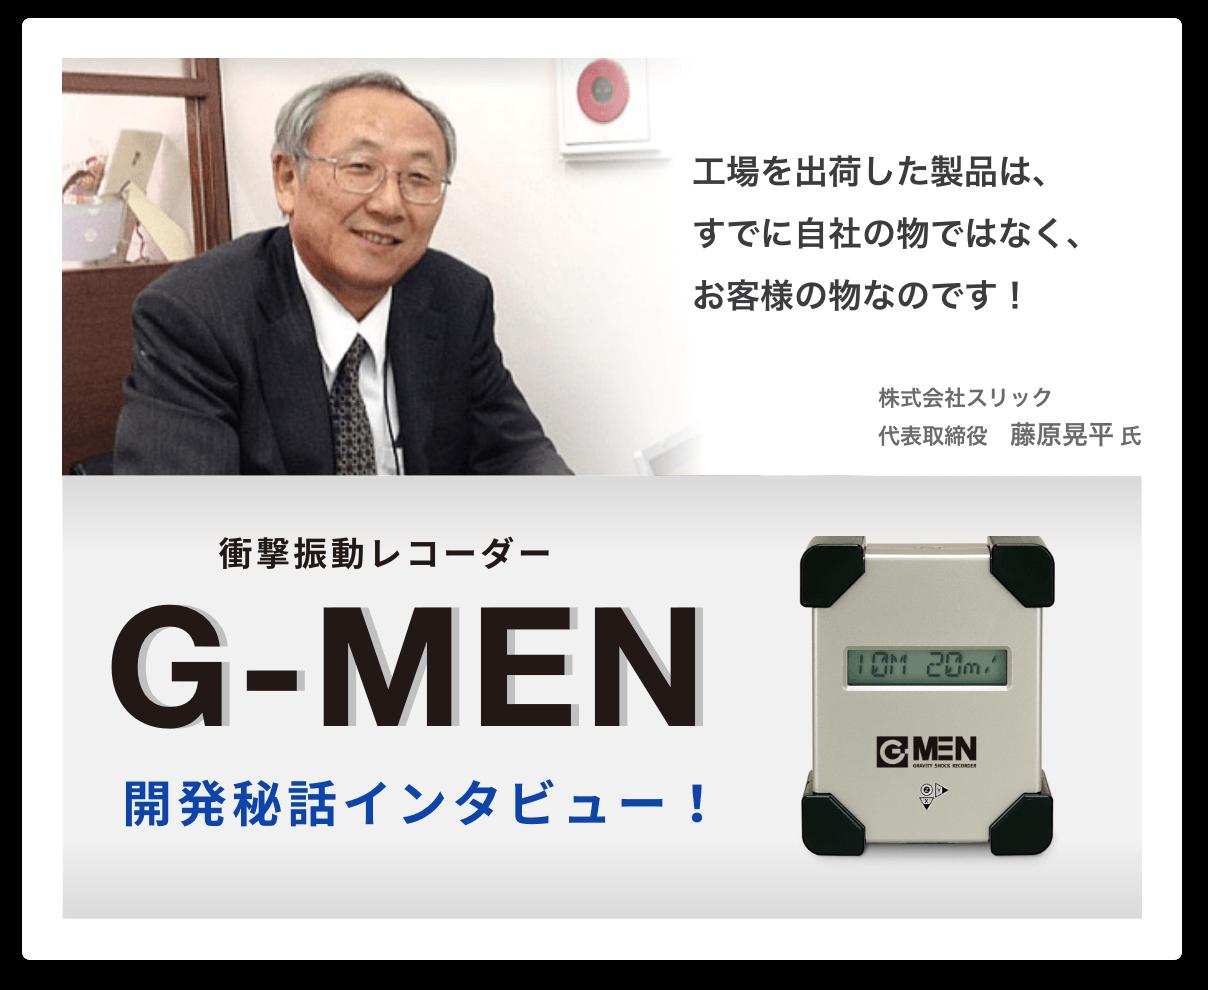 G-MEN開発秘話インタビュー